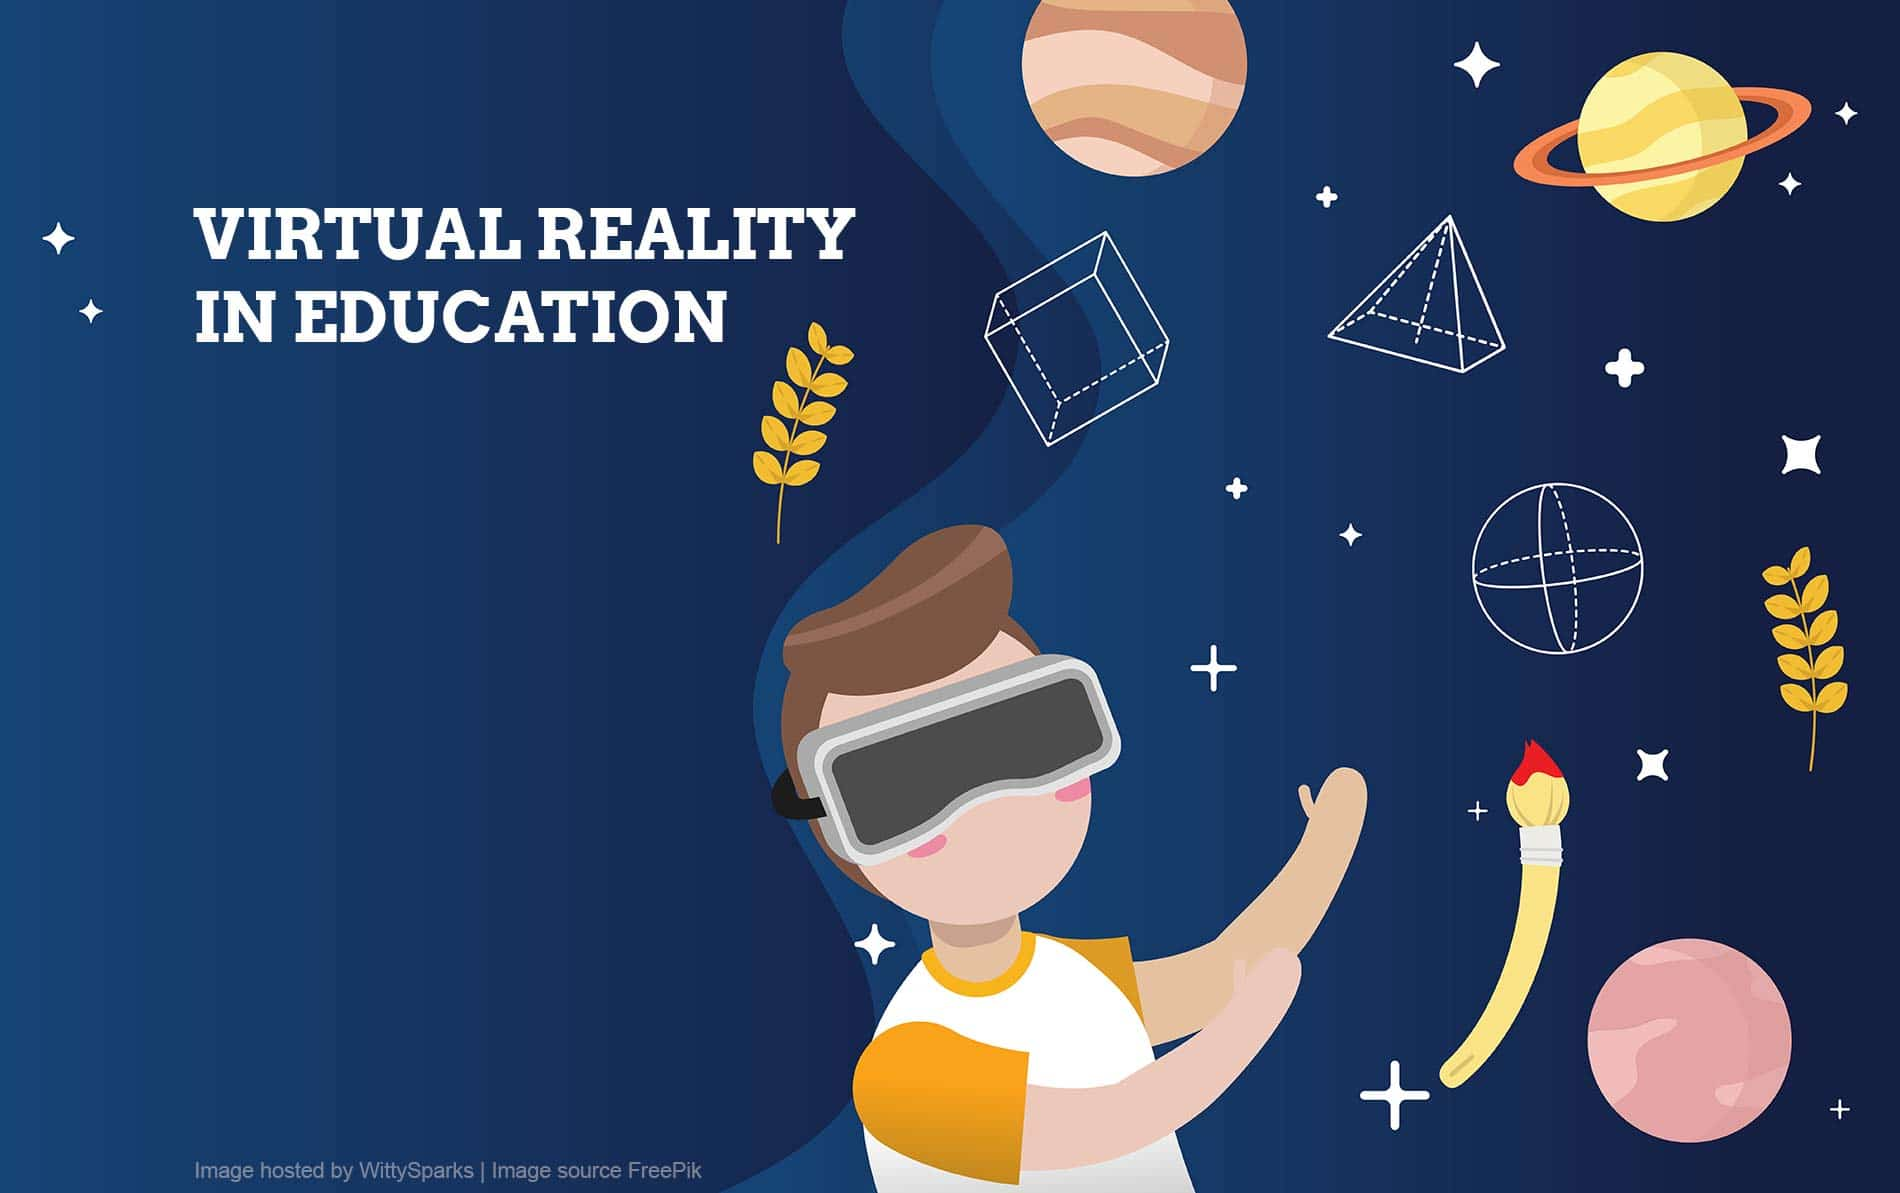 VR in education, school classrooms